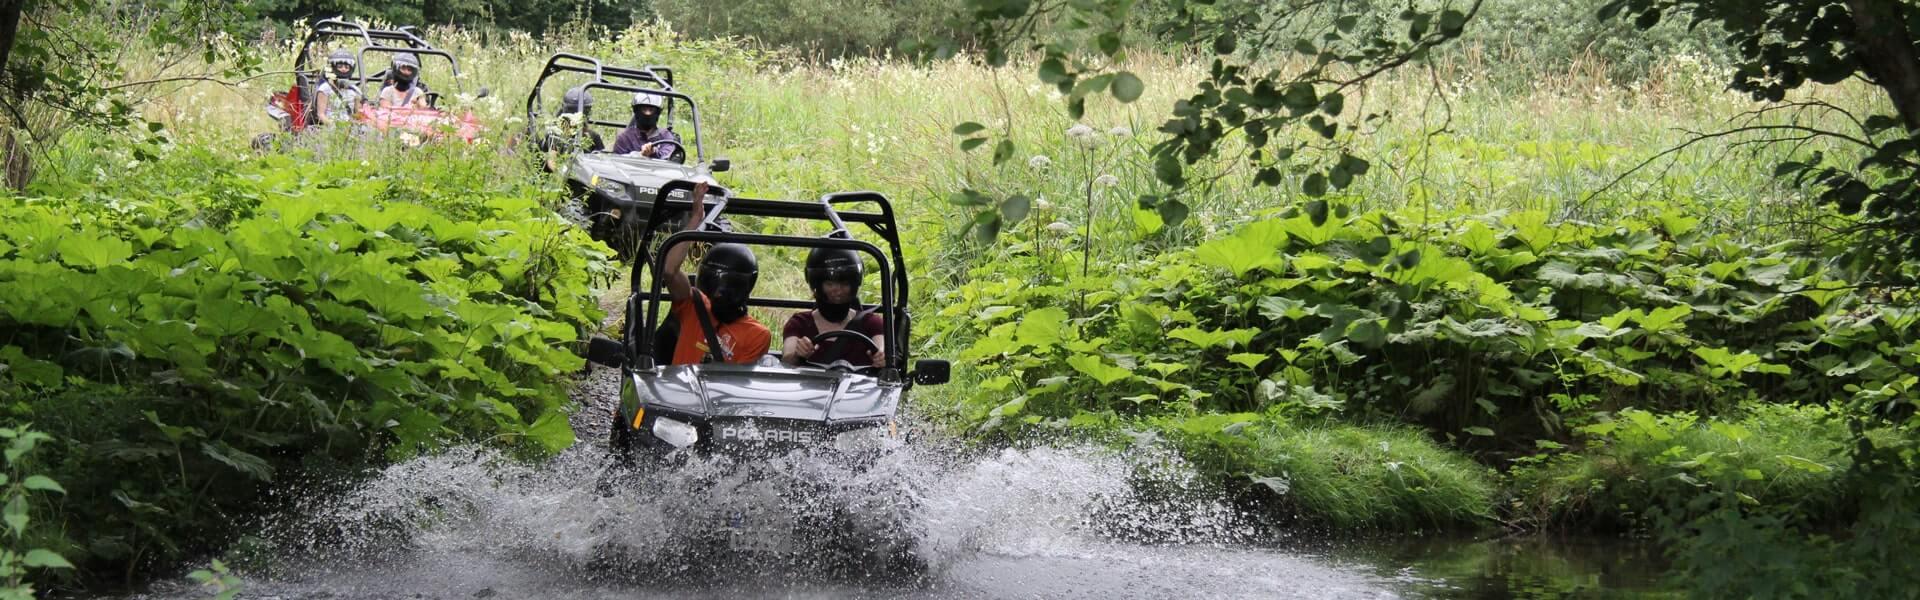 Wild Rallye Xtreme als outdoor Teambuilding Idee mit b-ceed